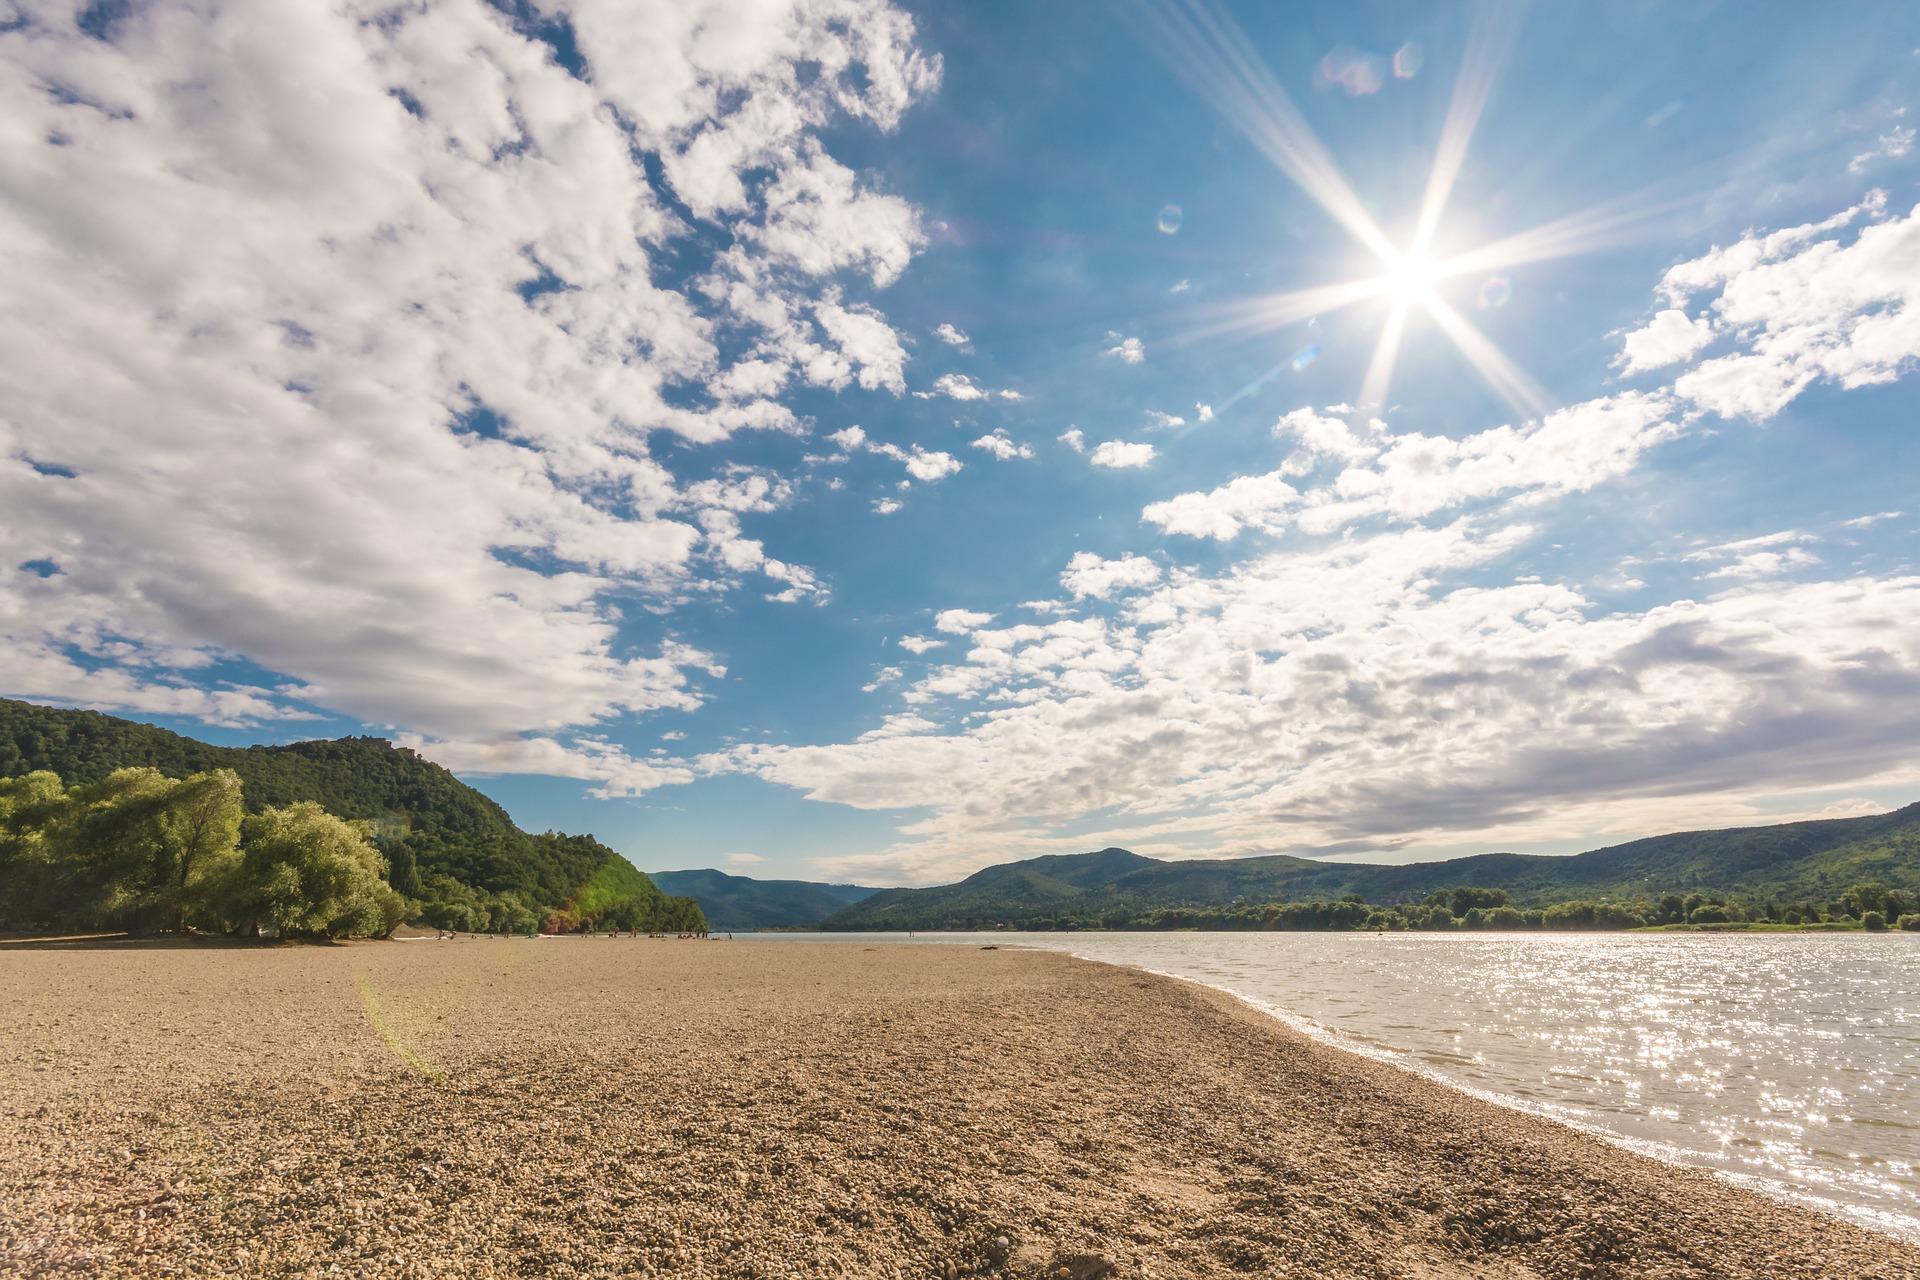 Lingering Summer Heat Helps Natural Gas ETF Maintain Momentum